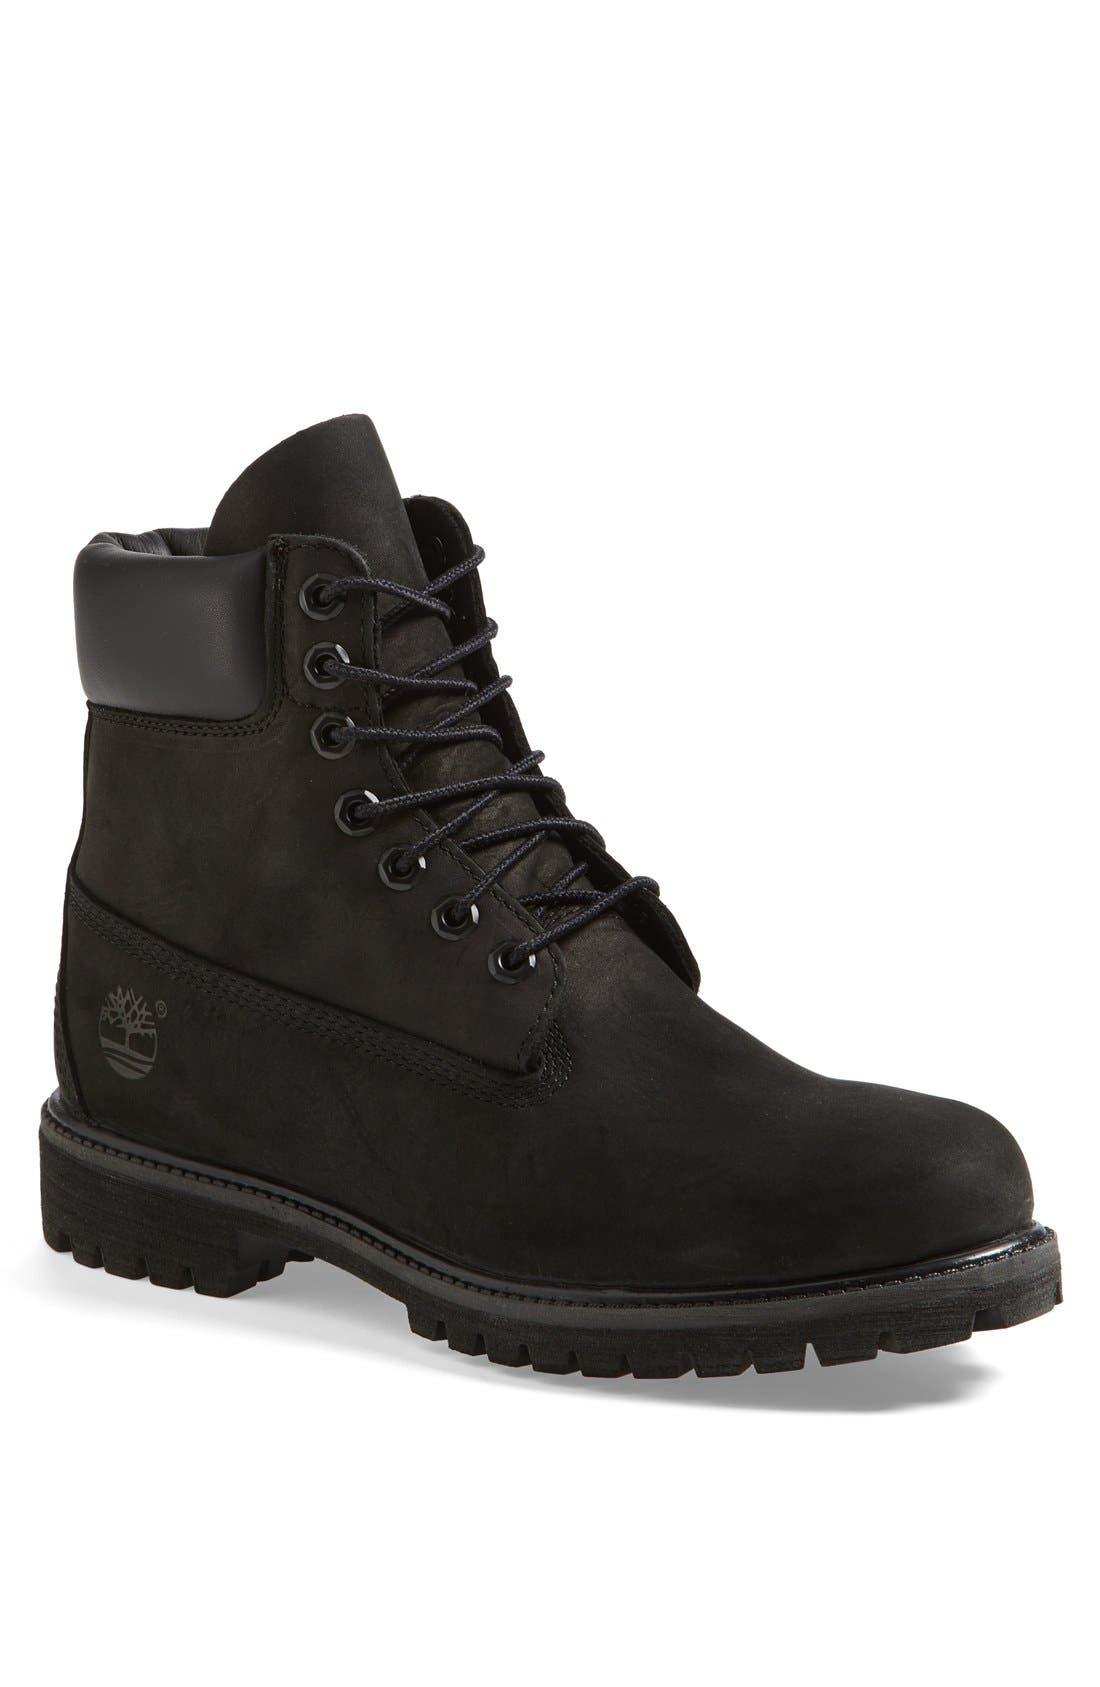 'Six Inch Classic Boots - Premium' Boot,                             Main thumbnail 1, color,                             Black